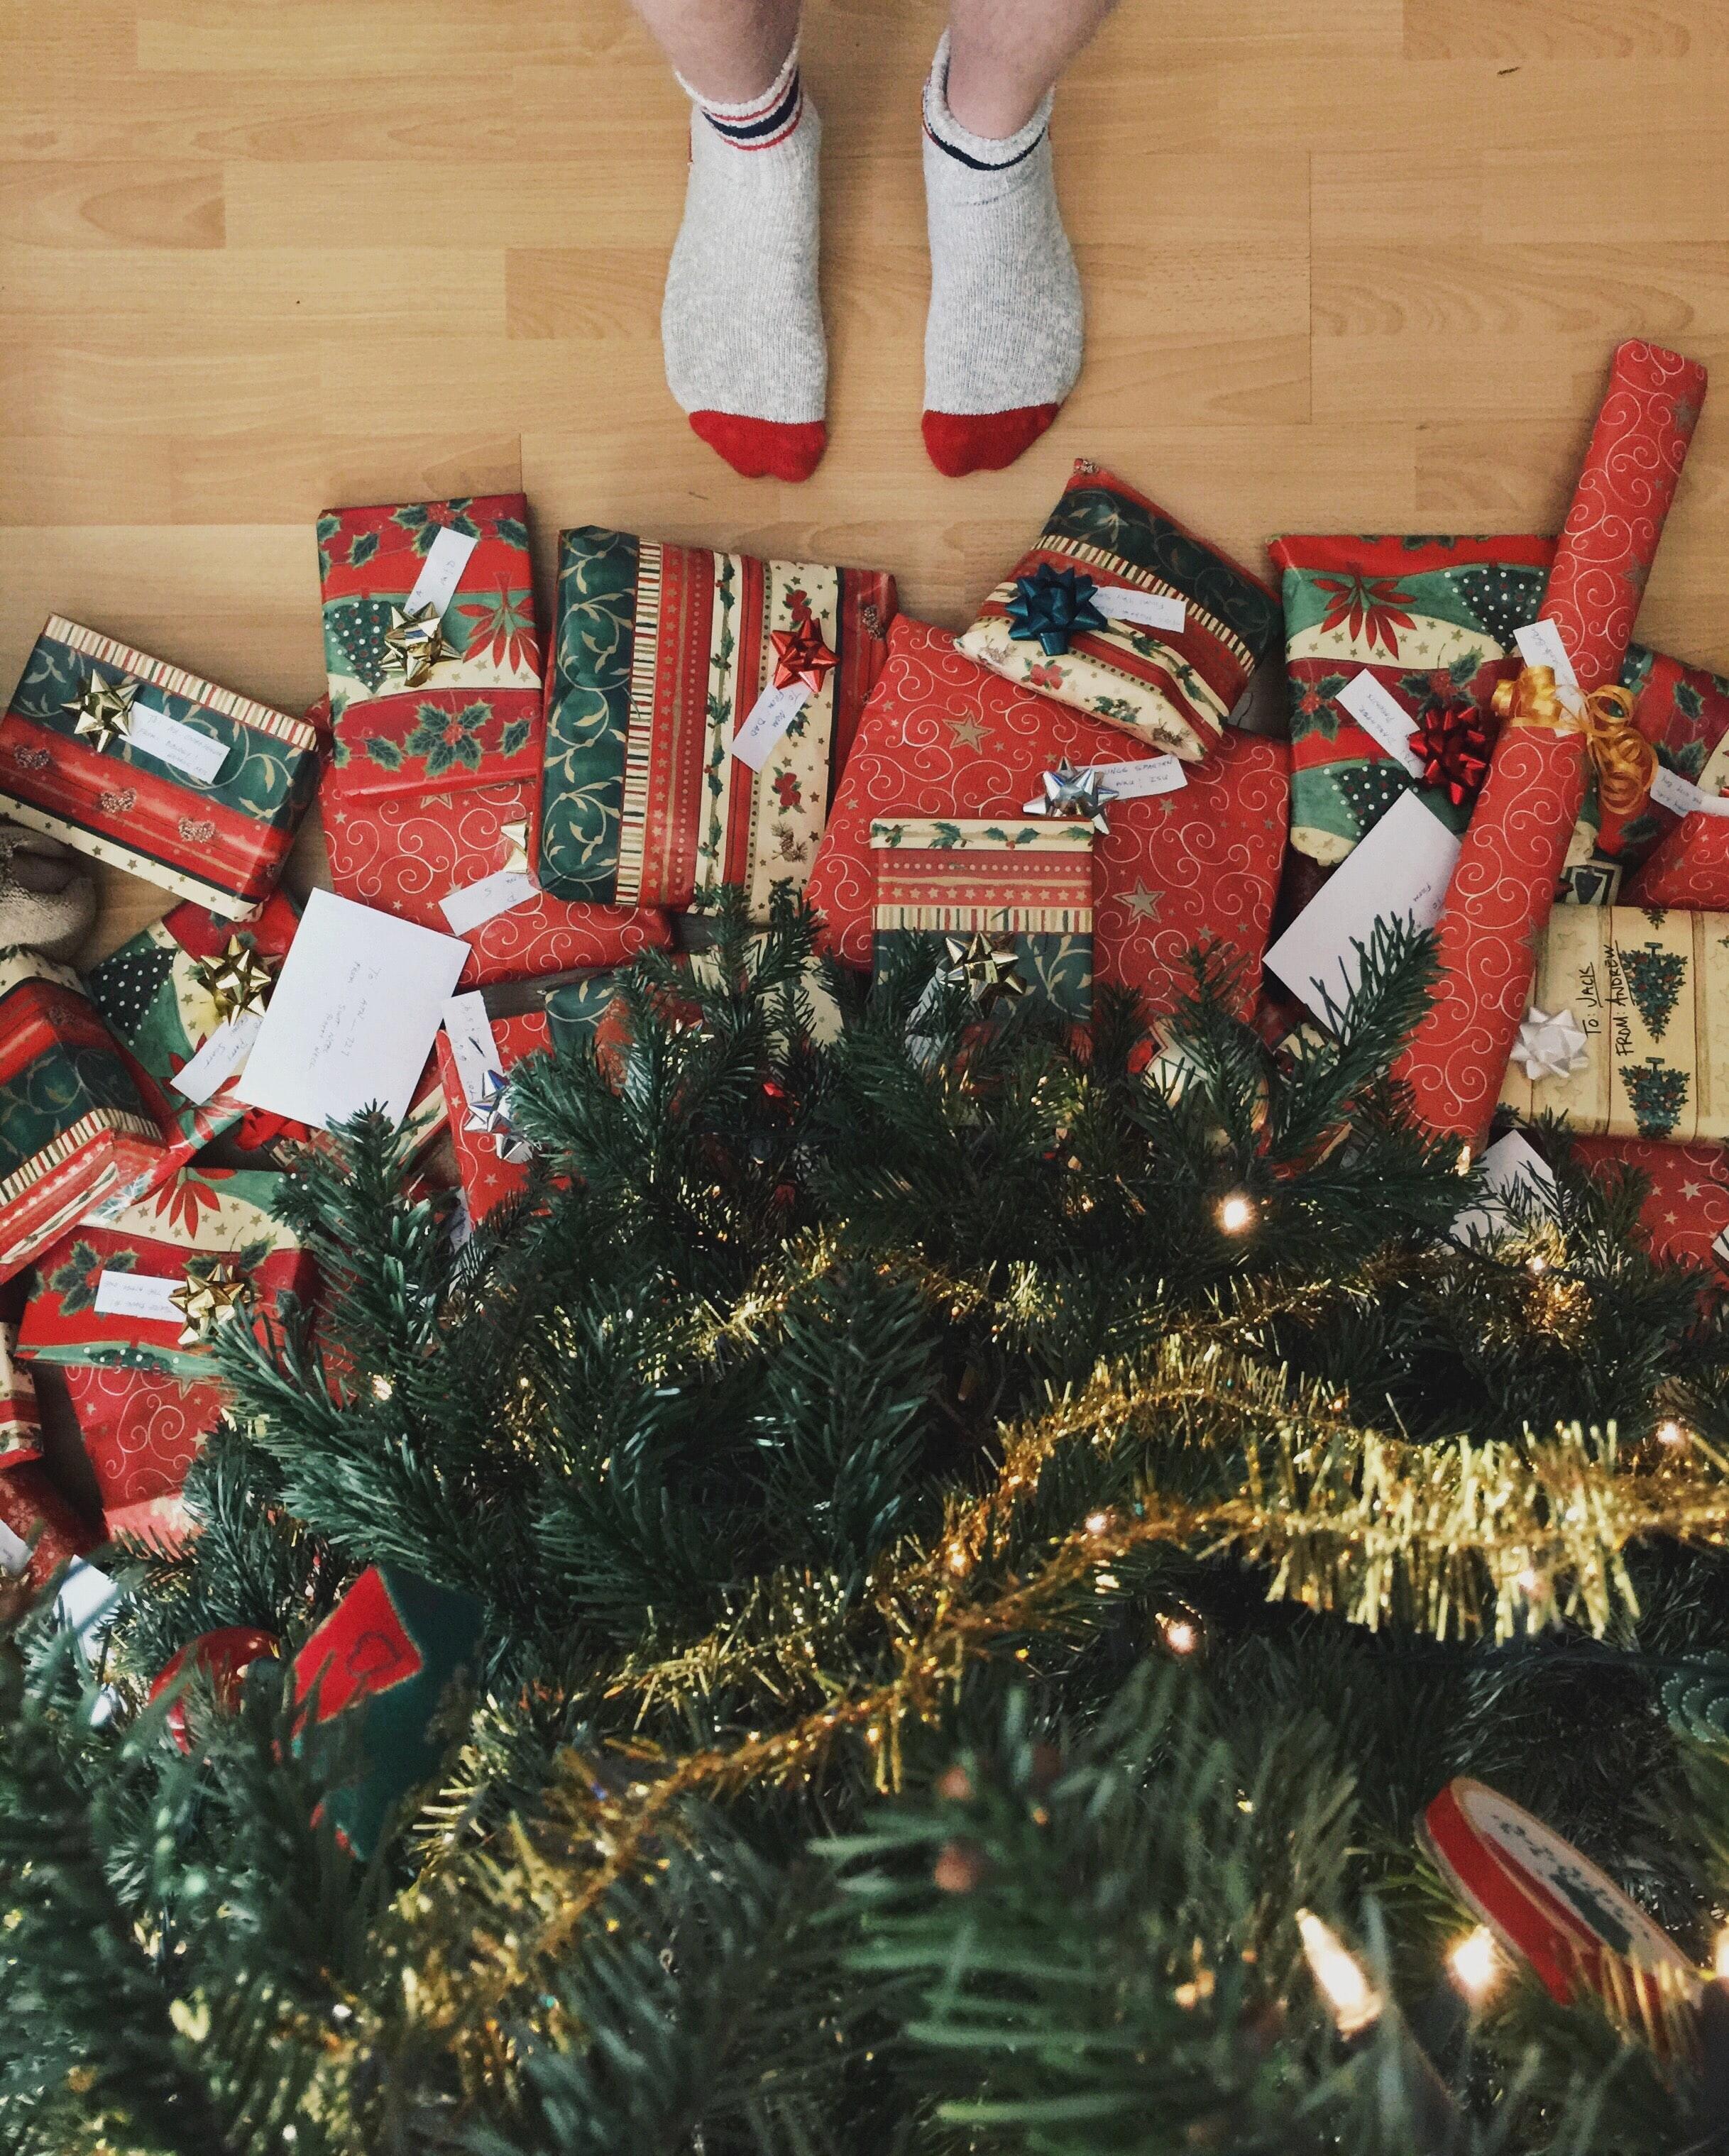 Top tips on Christmas gifting for Christian parents